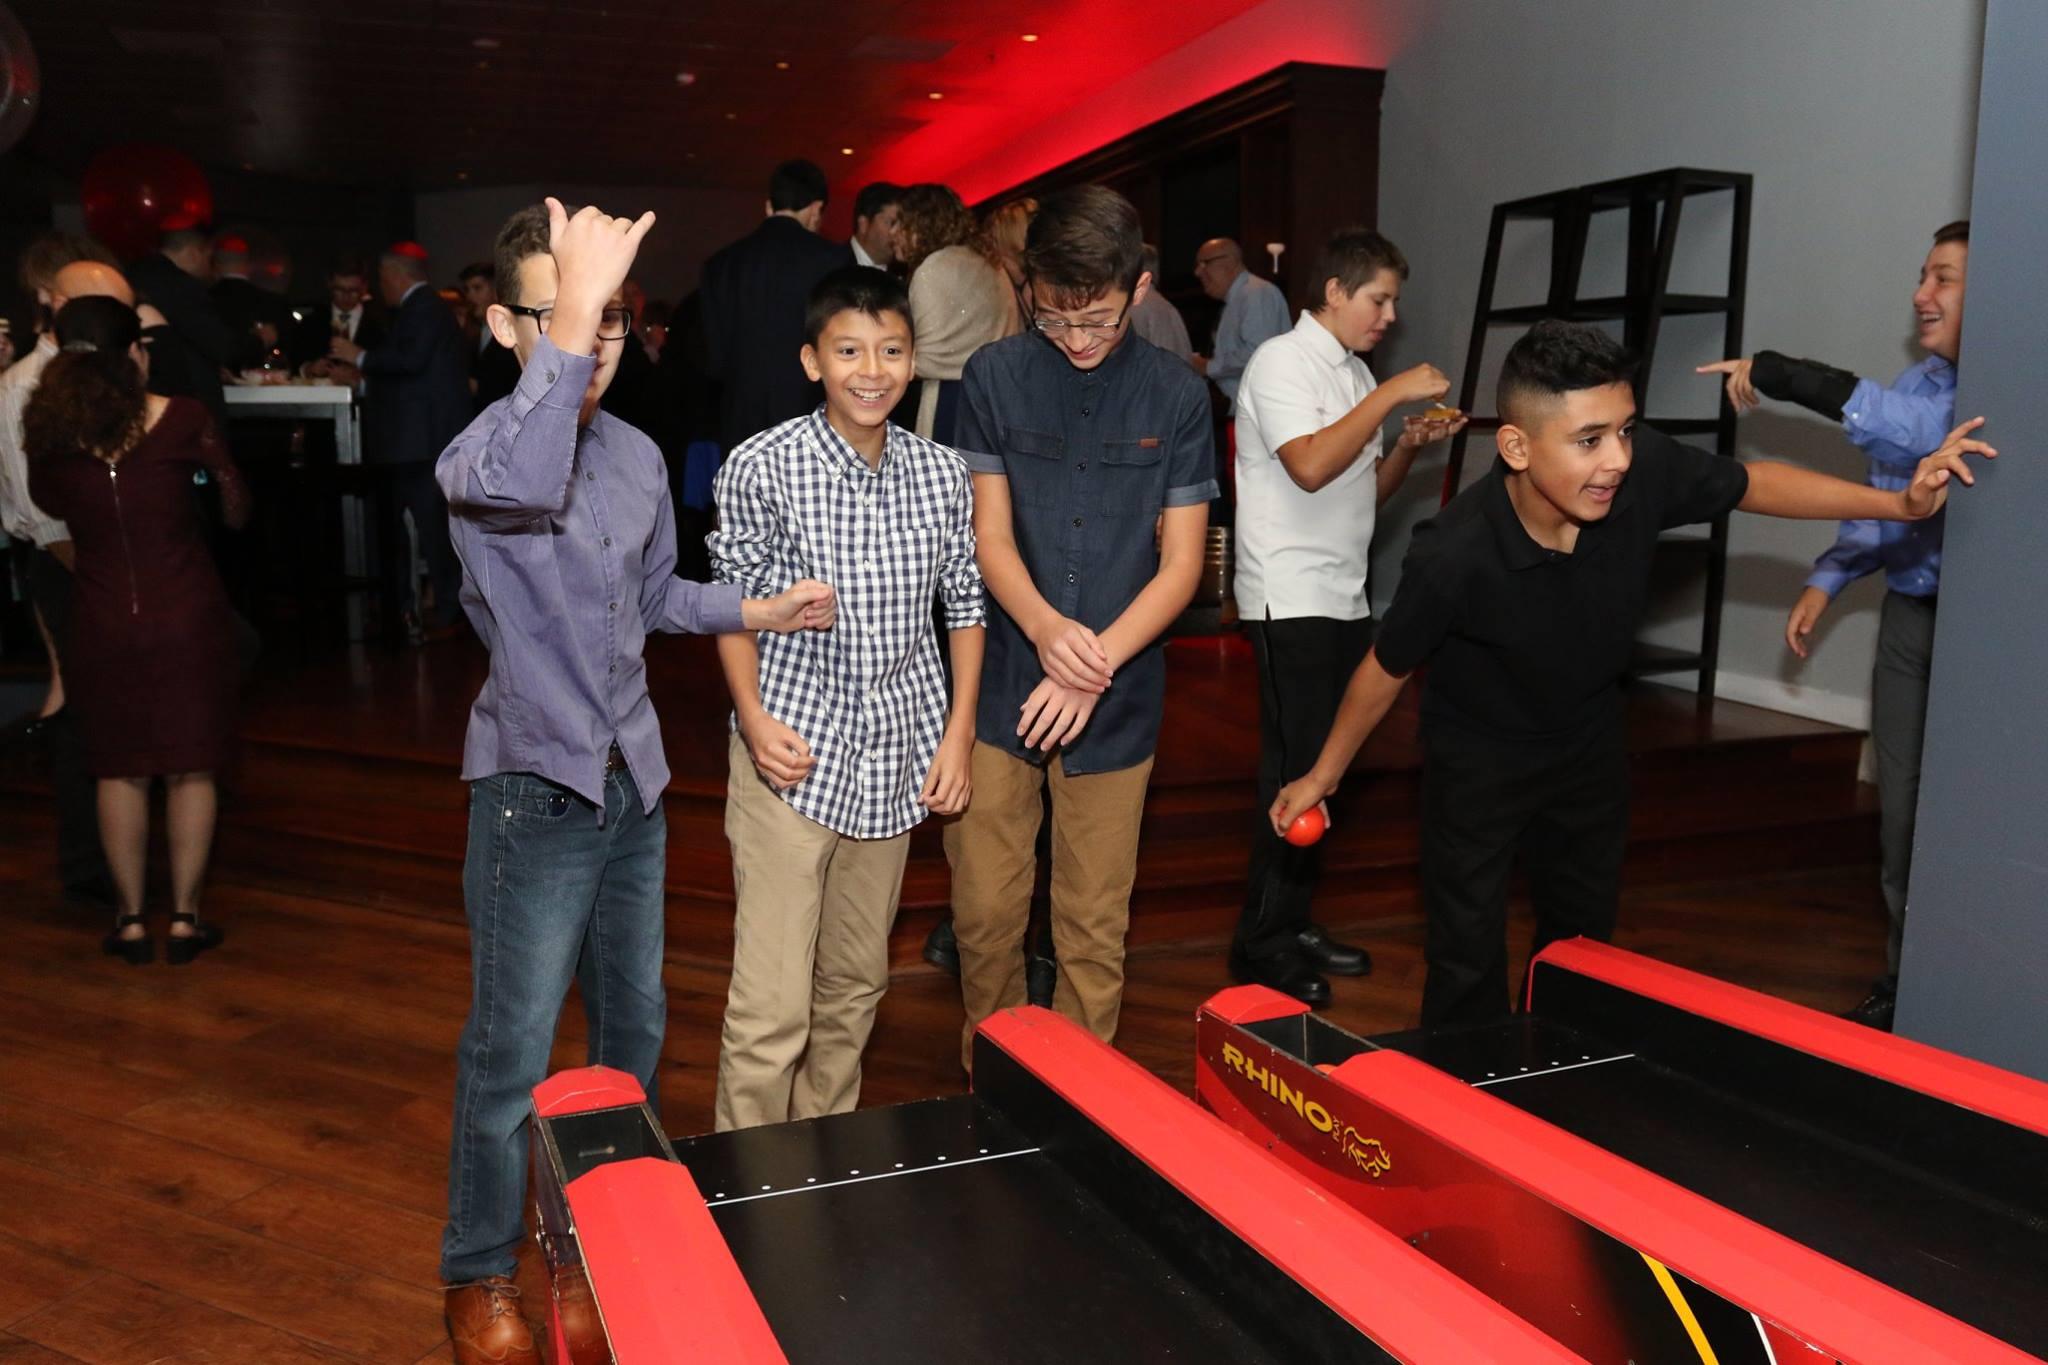 Skeeball game rentals NY NJ CT